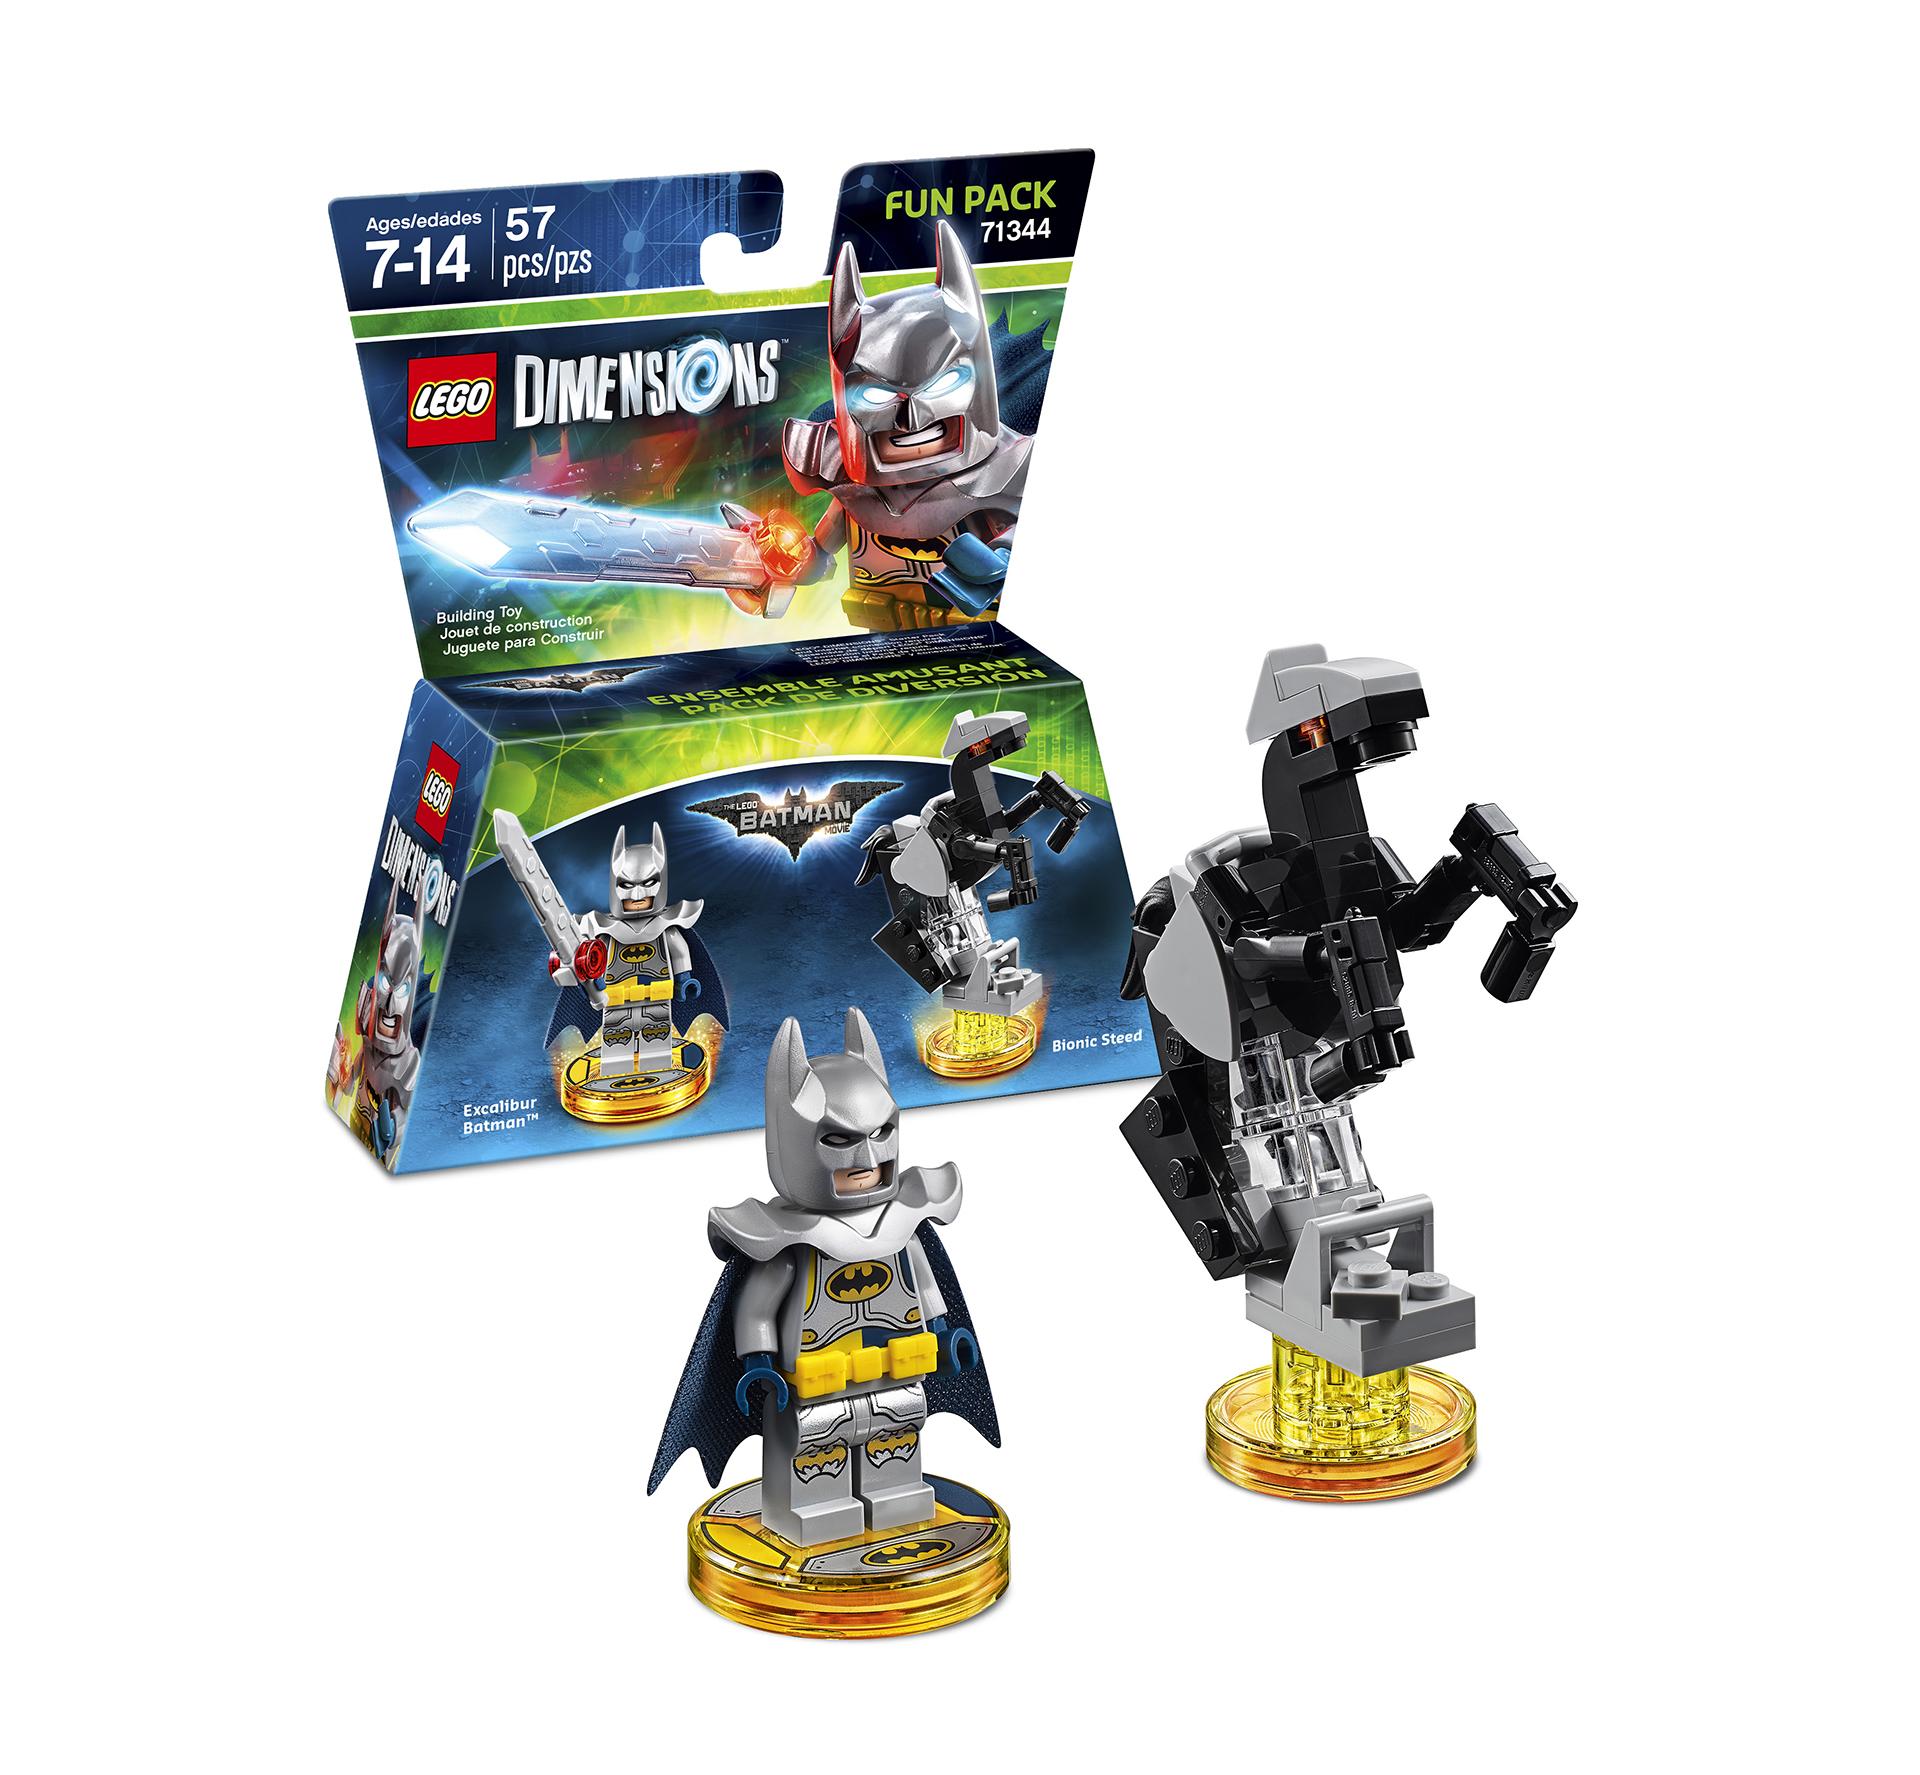 LEGO Dimensions - Excalibur Batman Fun Pack